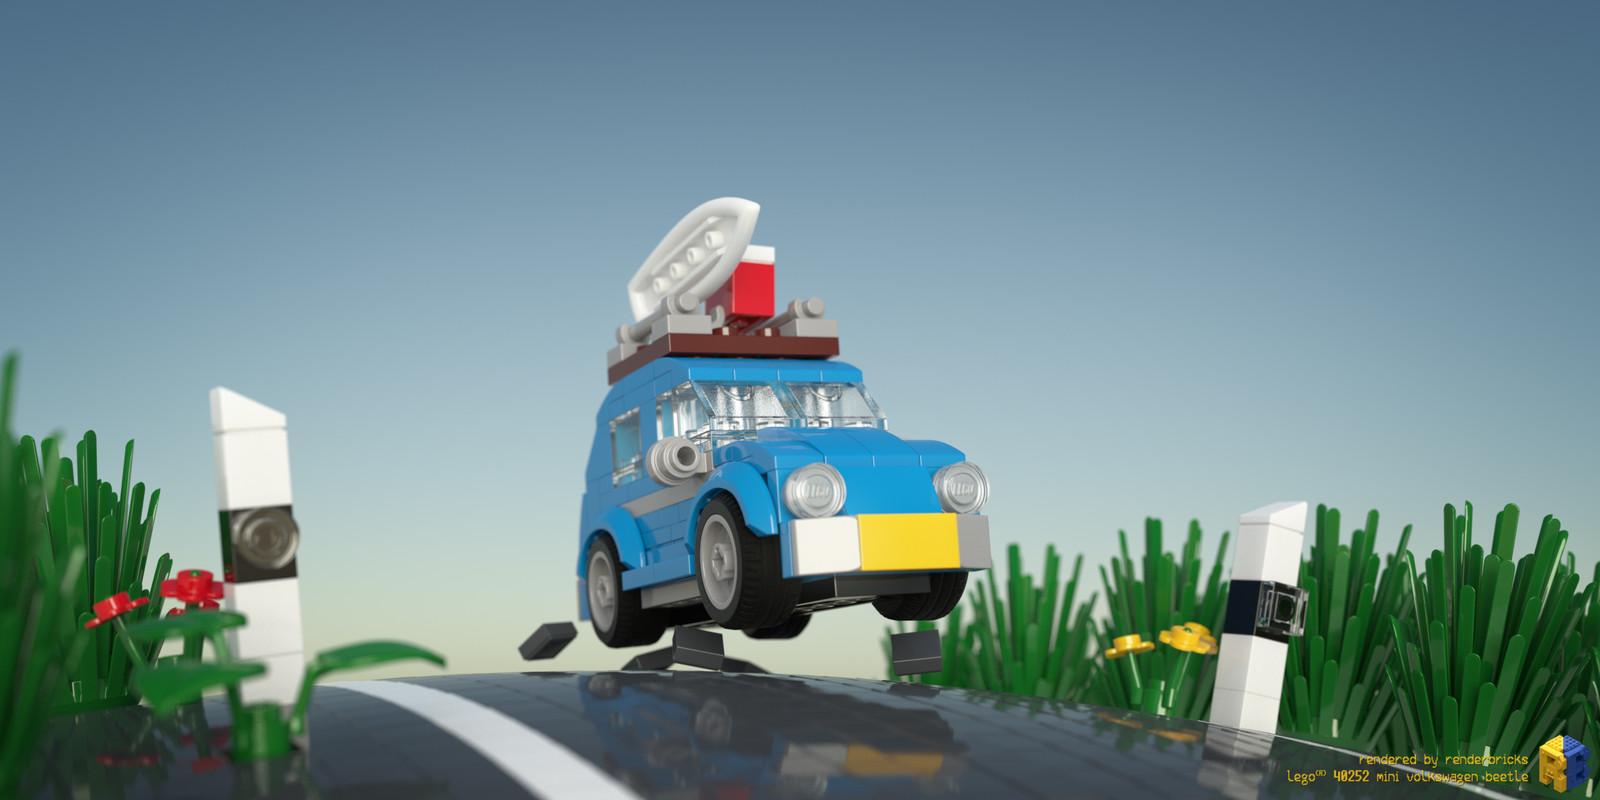 LEGO Bau- & Konstruktionsspielzeug Lego 40252 VW Mini Beetle Creator